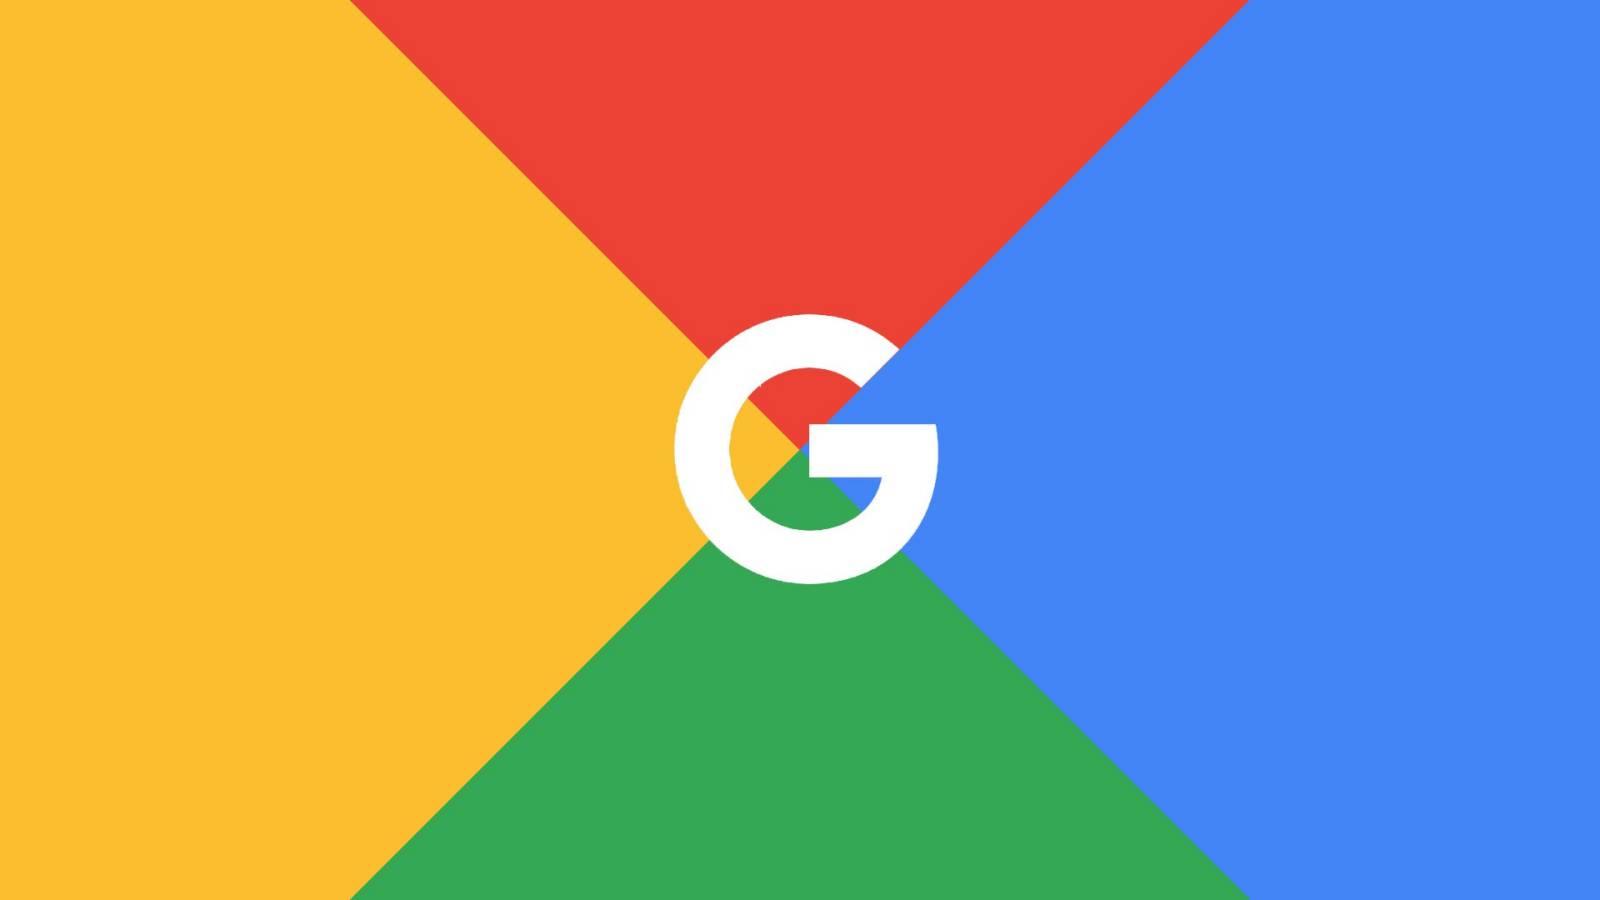 Google Schimbari confidentialitatea datelor oamenilor